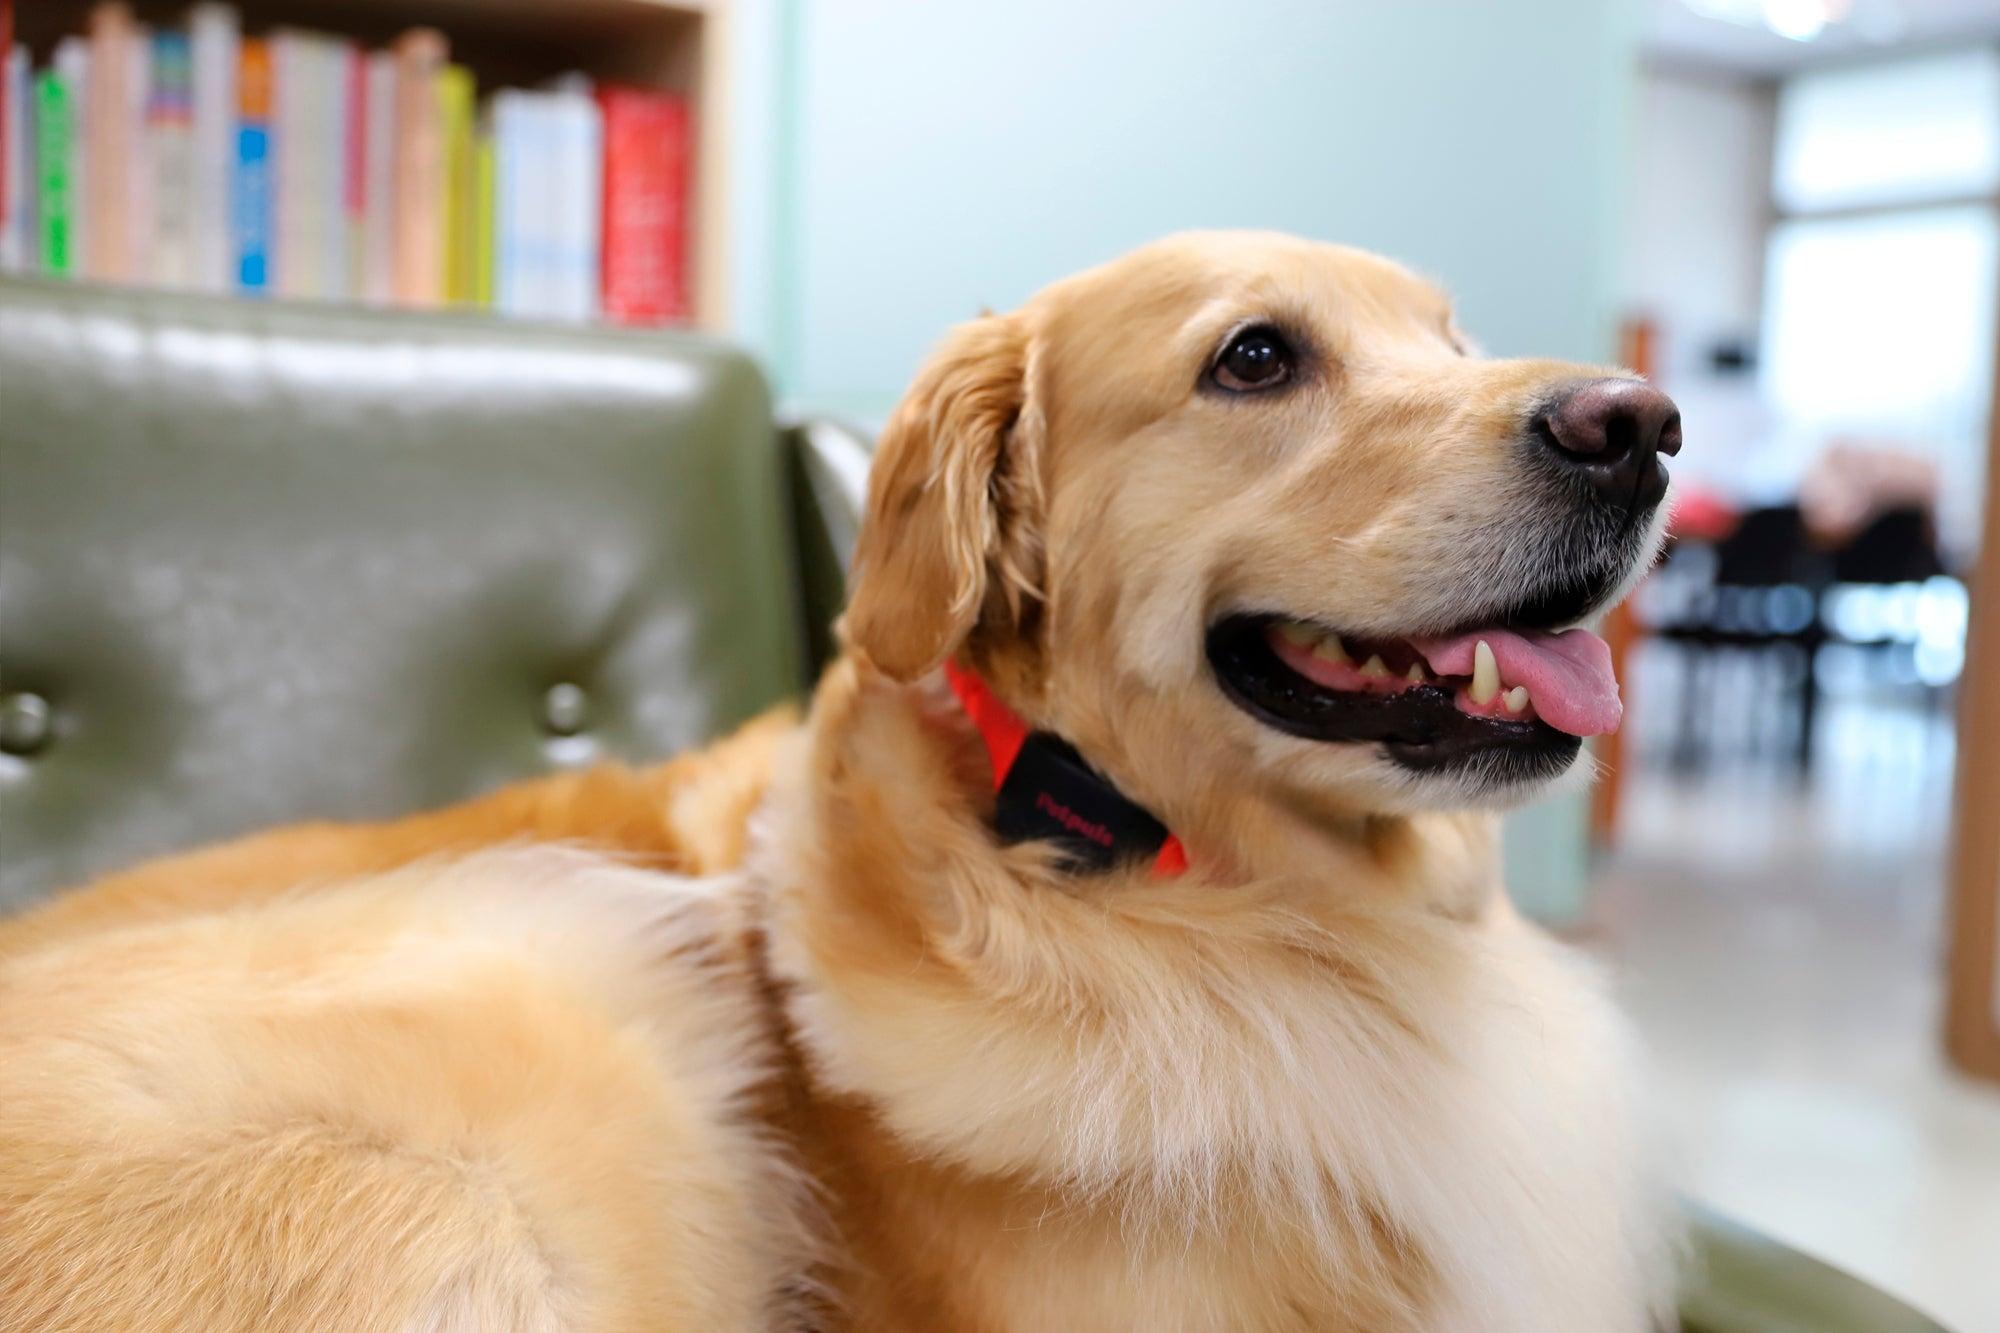 entrepreneur.com - Entrepreneur en Español - You can understand your tenderloin! This collar translates your dog's barking using artificial intelligence